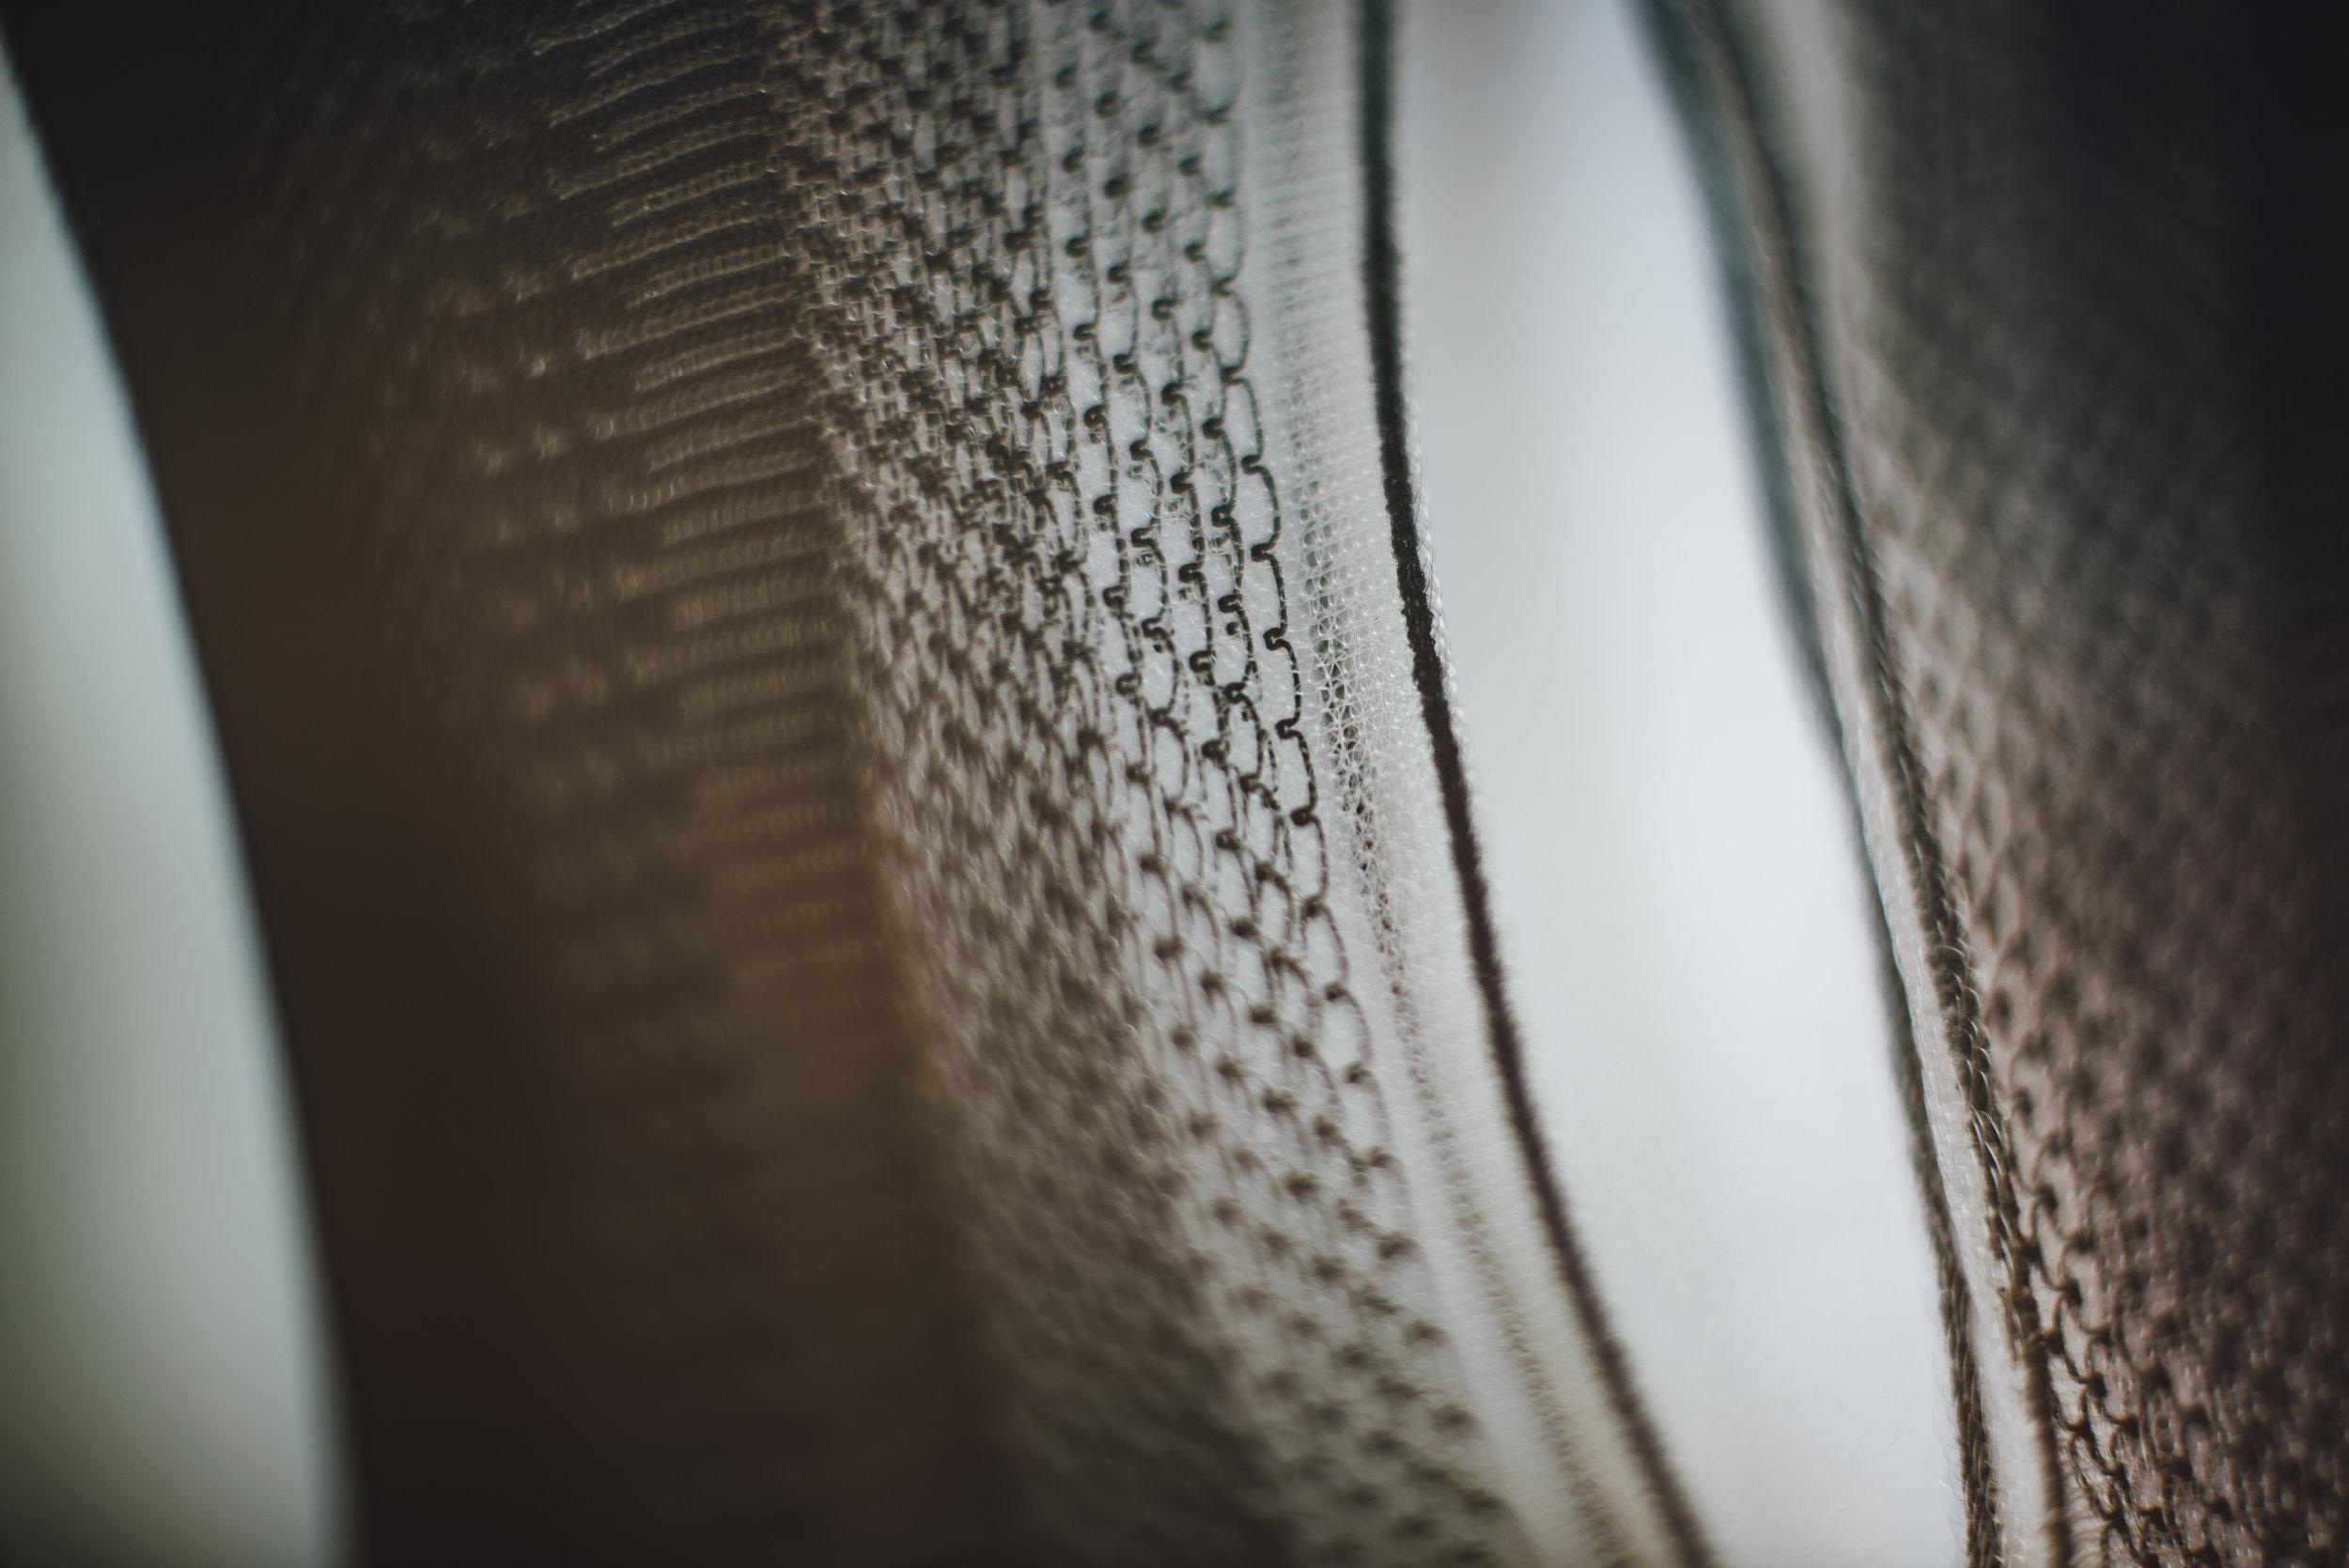 KnitIt_LizHilton_MatthewProvoastPhotography-2.jpg